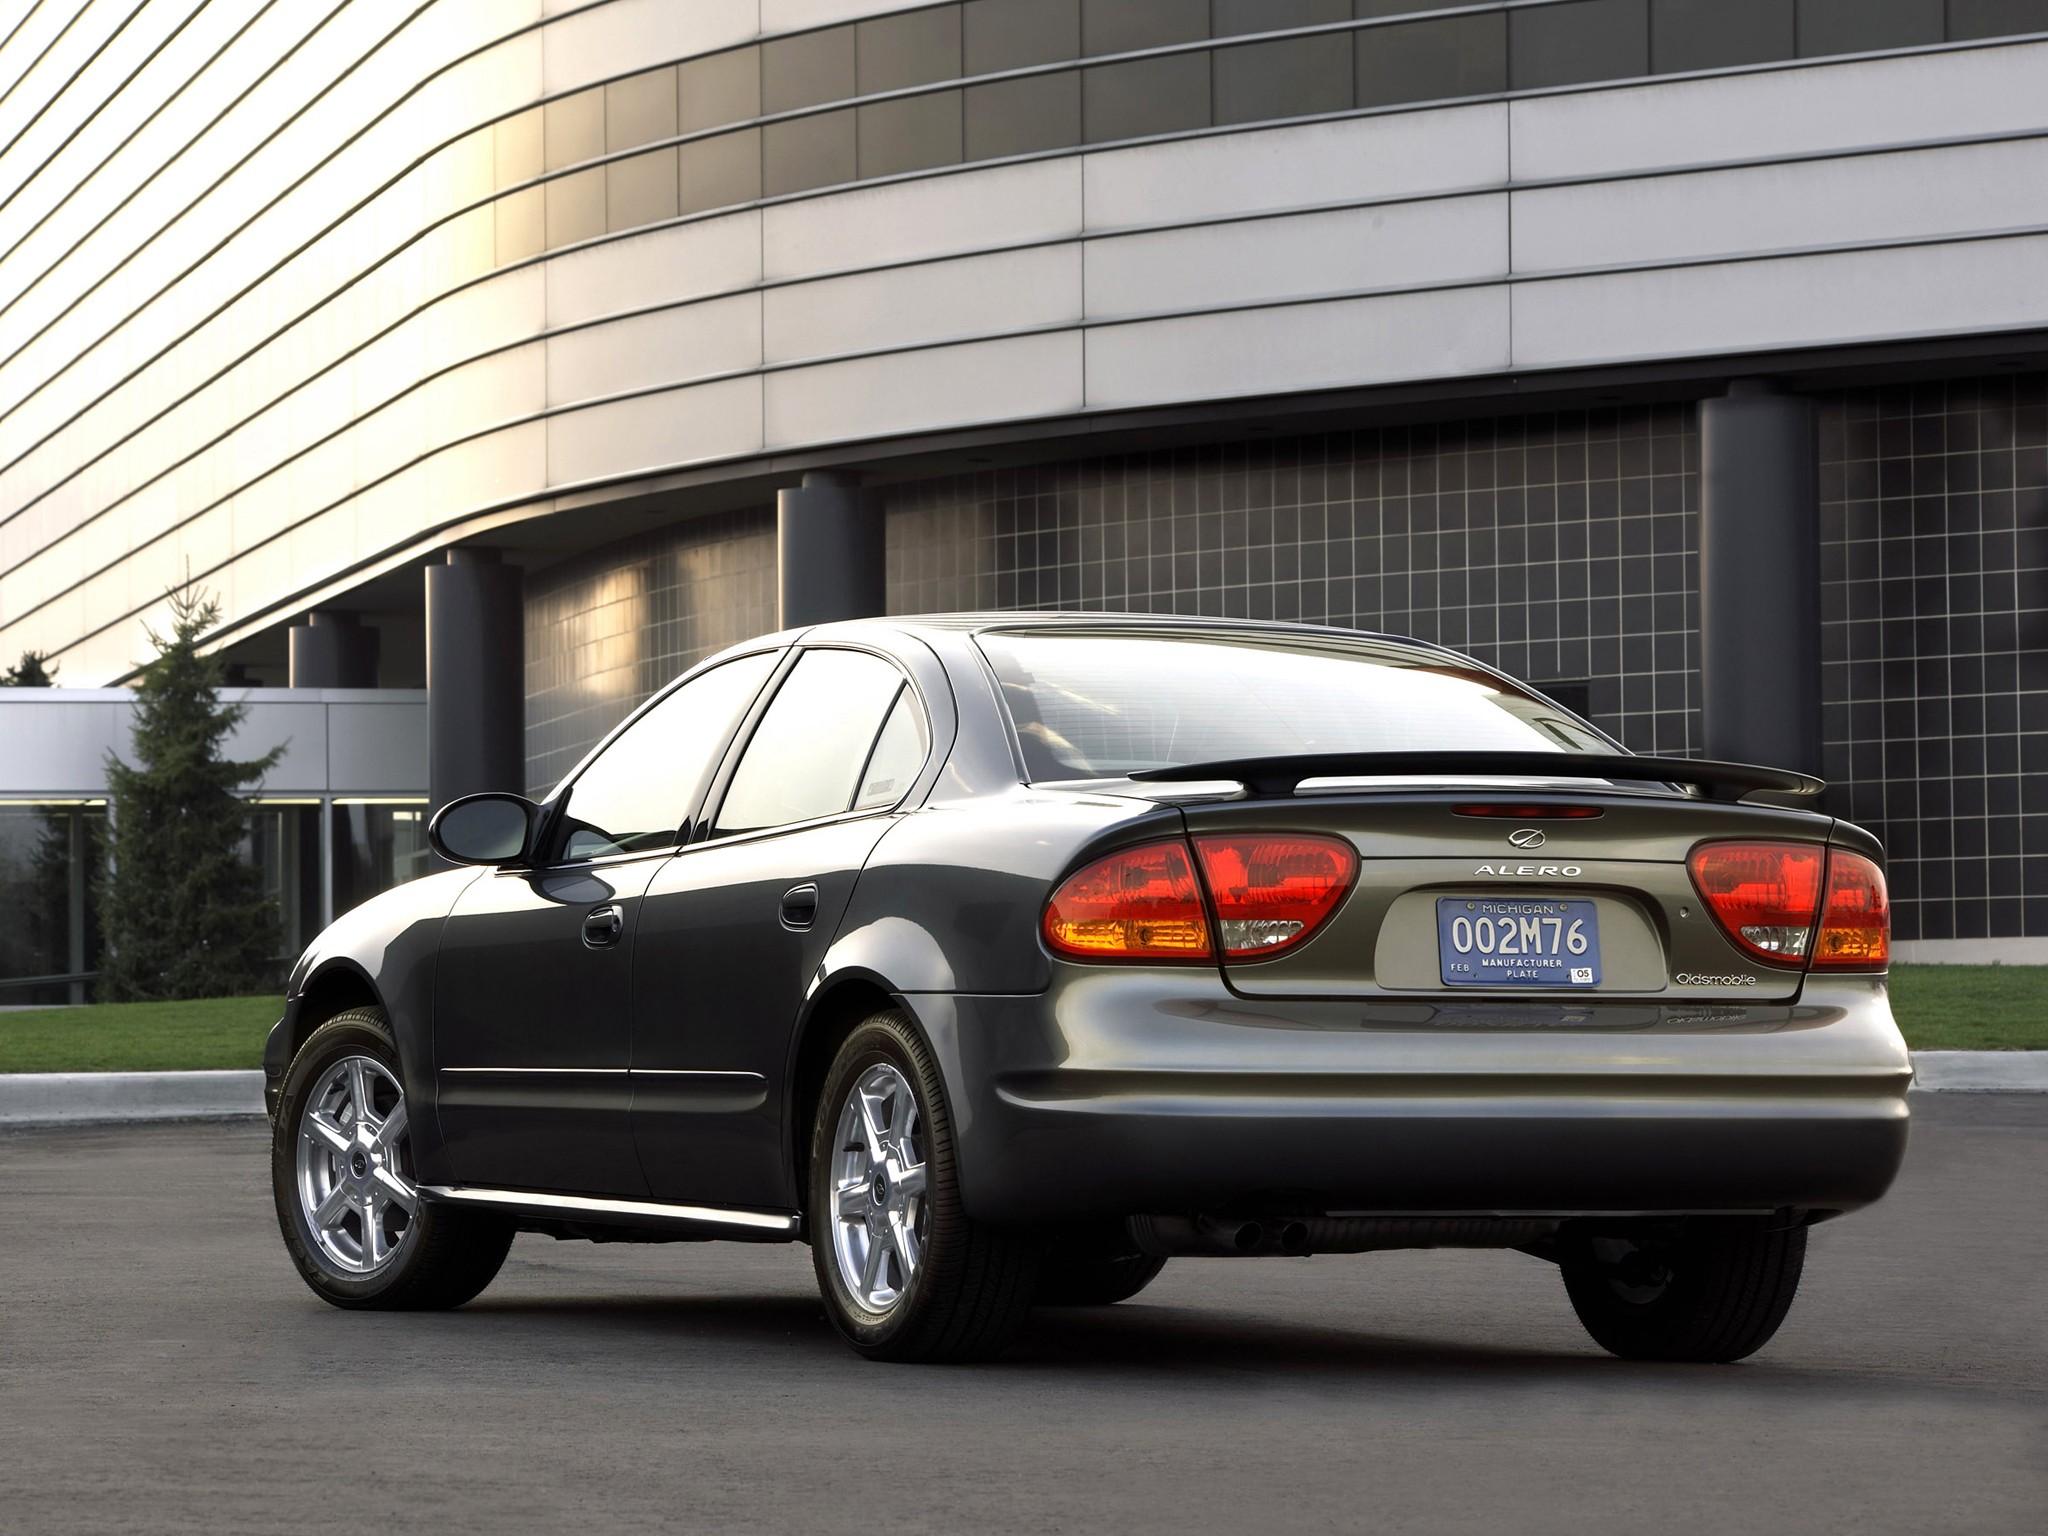 oldsmobile alero sedan specs 1999 2000 2001 2002. Black Bedroom Furniture Sets. Home Design Ideas